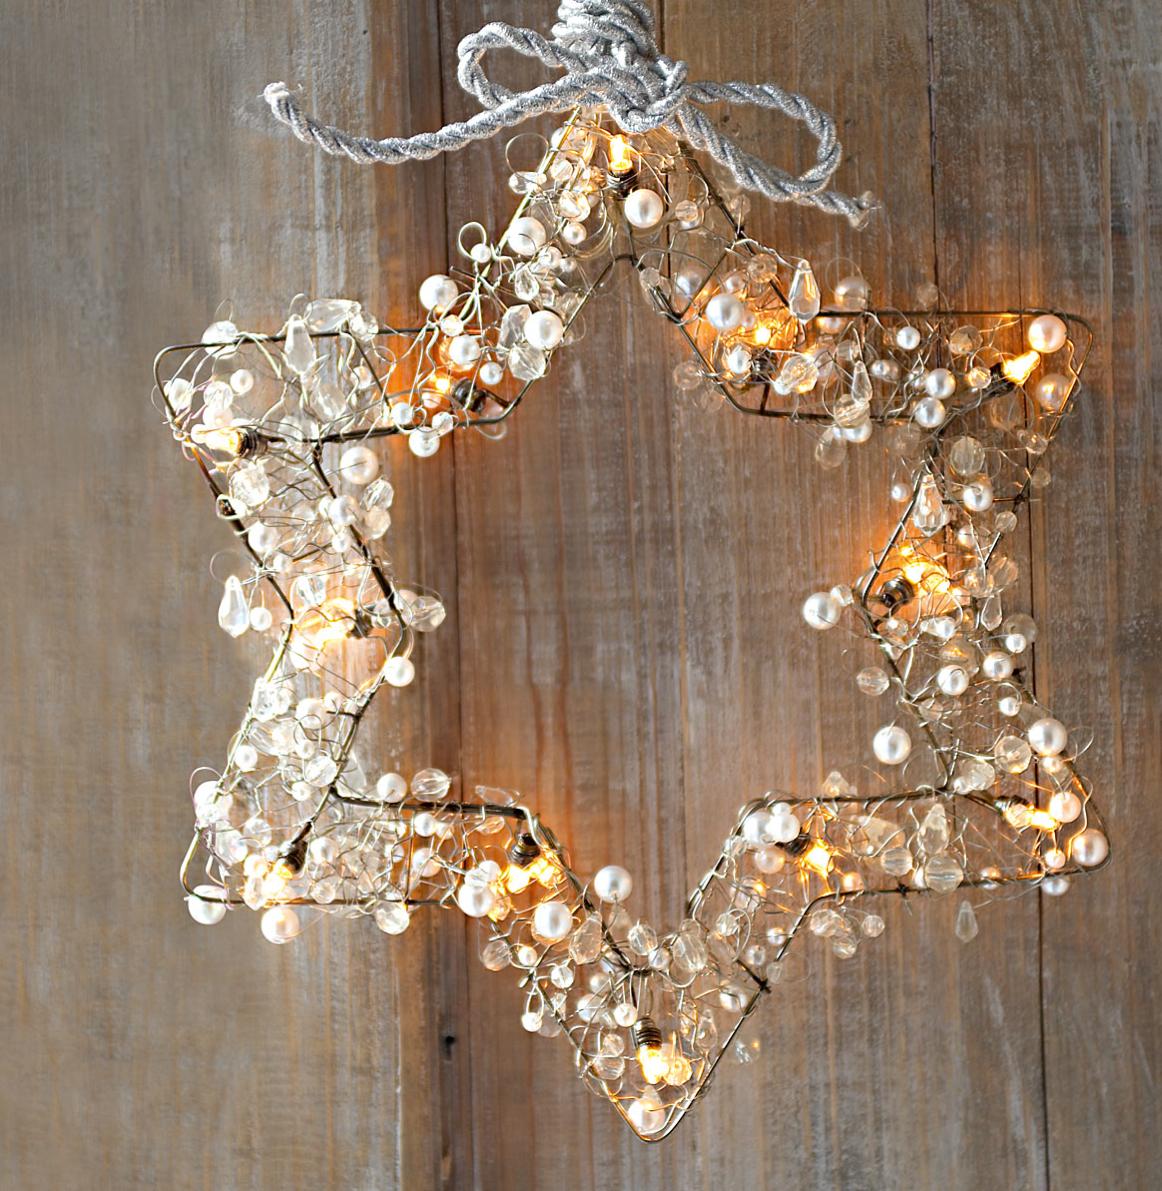 50 Trendy and Beautiful DIY Christmas Lights Decoration ...